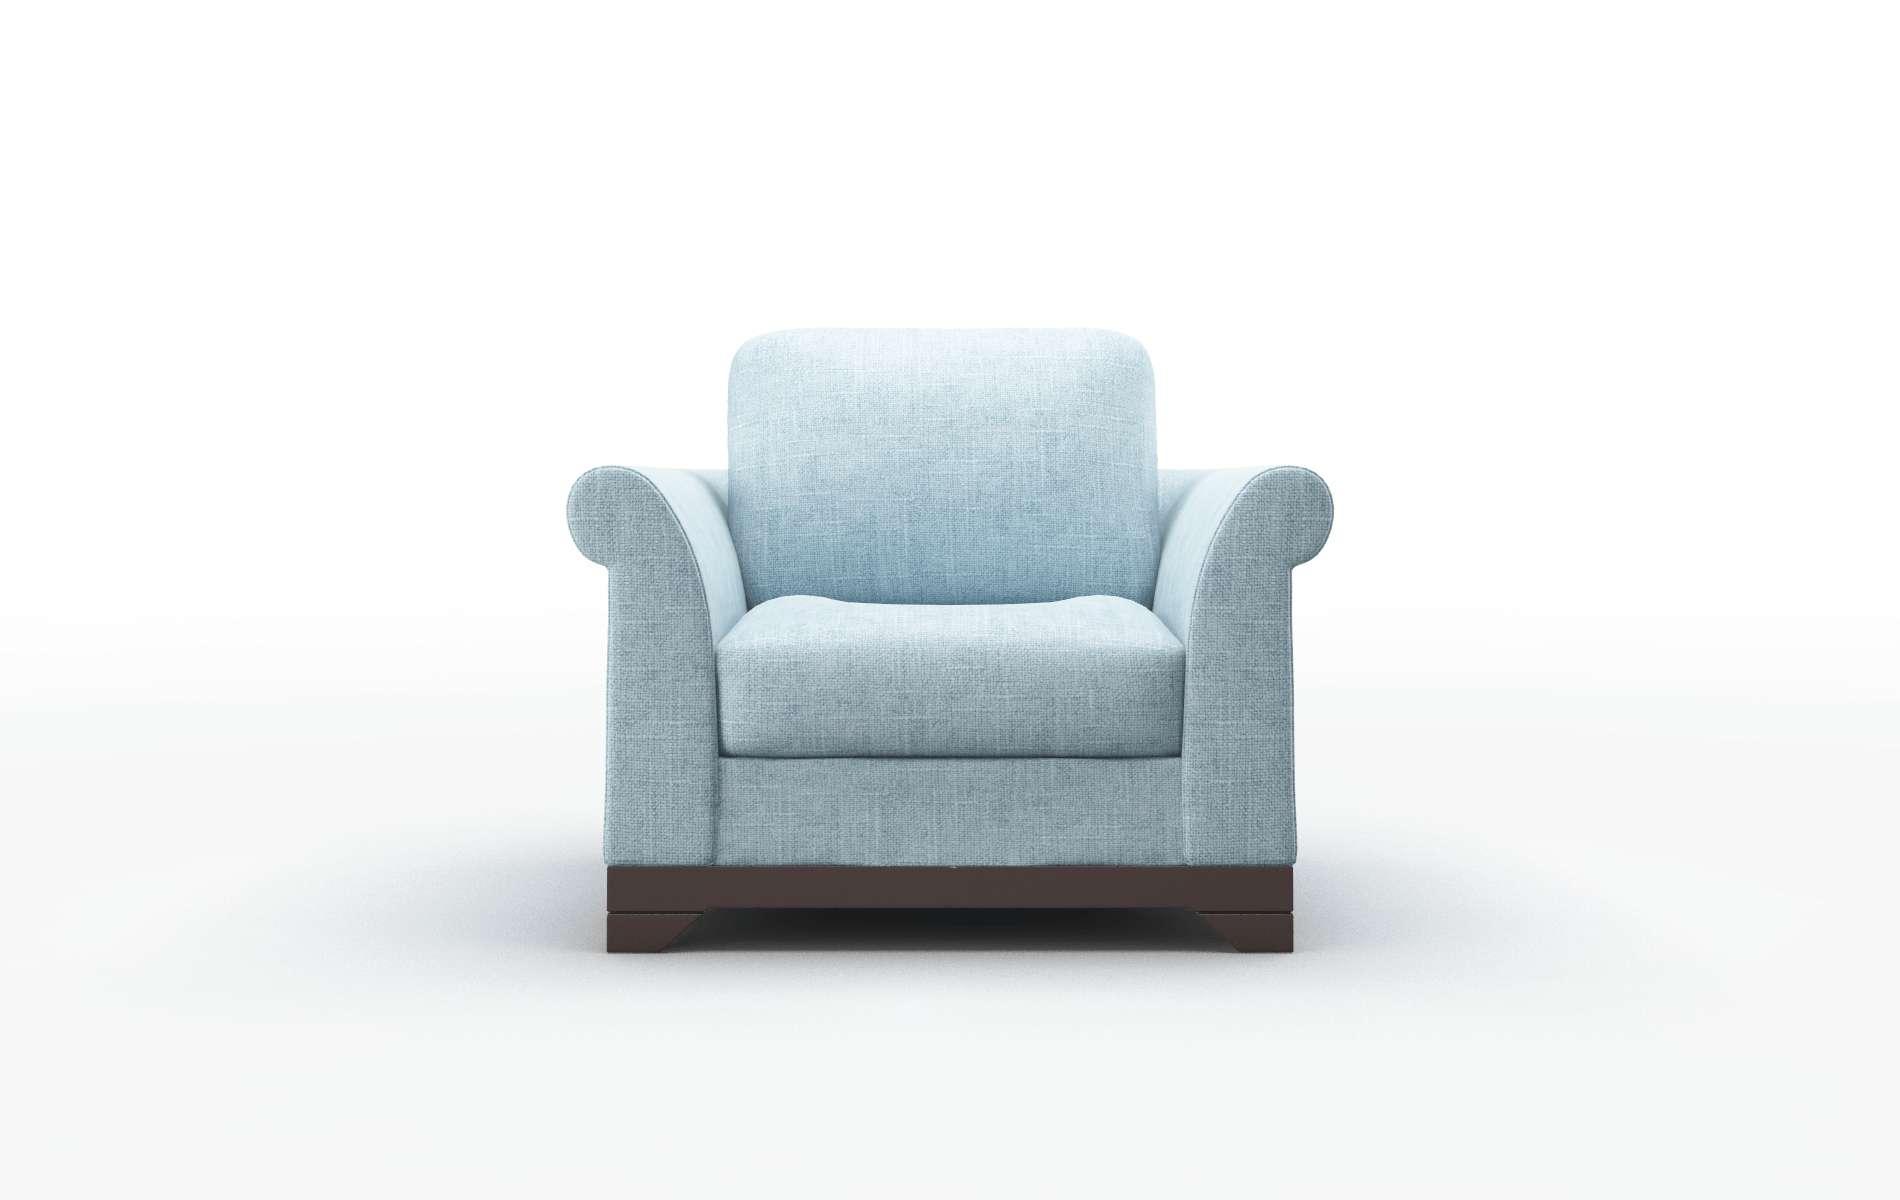 Denver Atlas Turquoise chair espresso legs